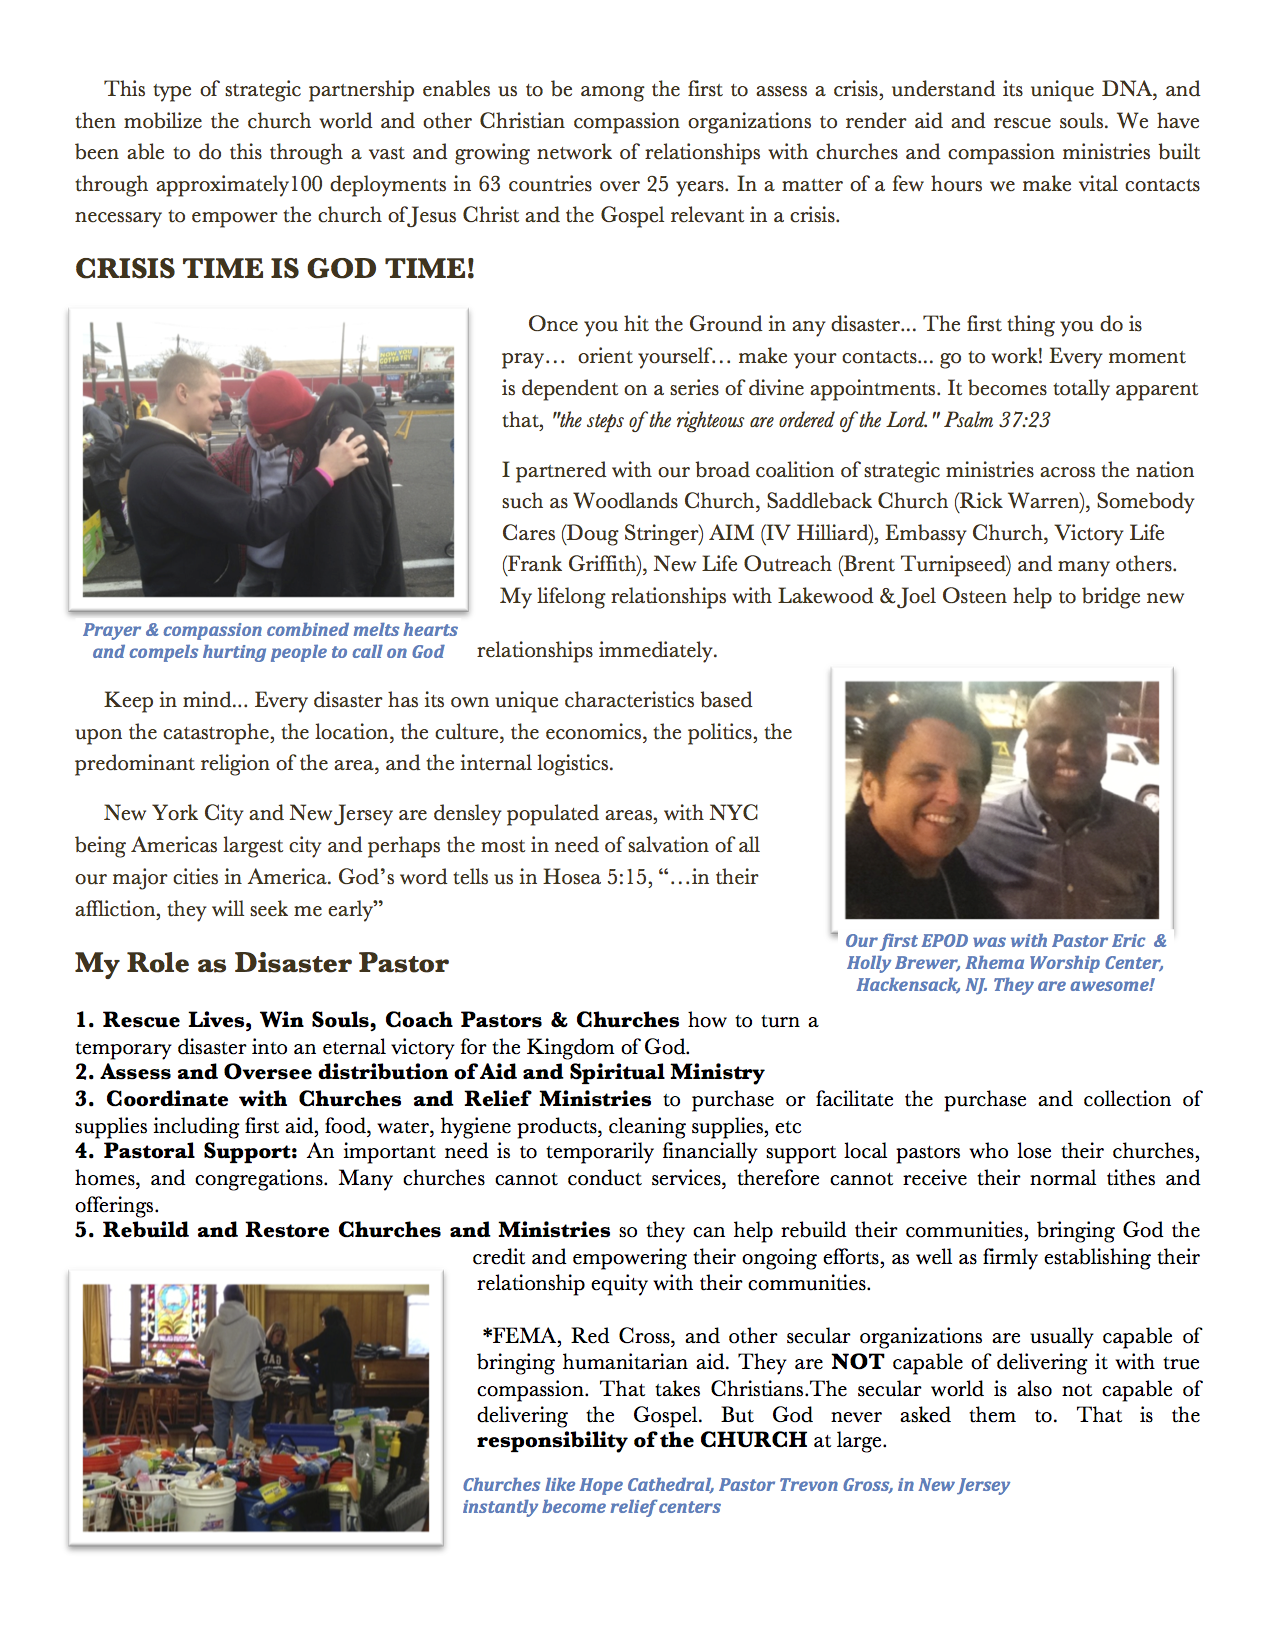 NYNJSandyNewsletter2.png